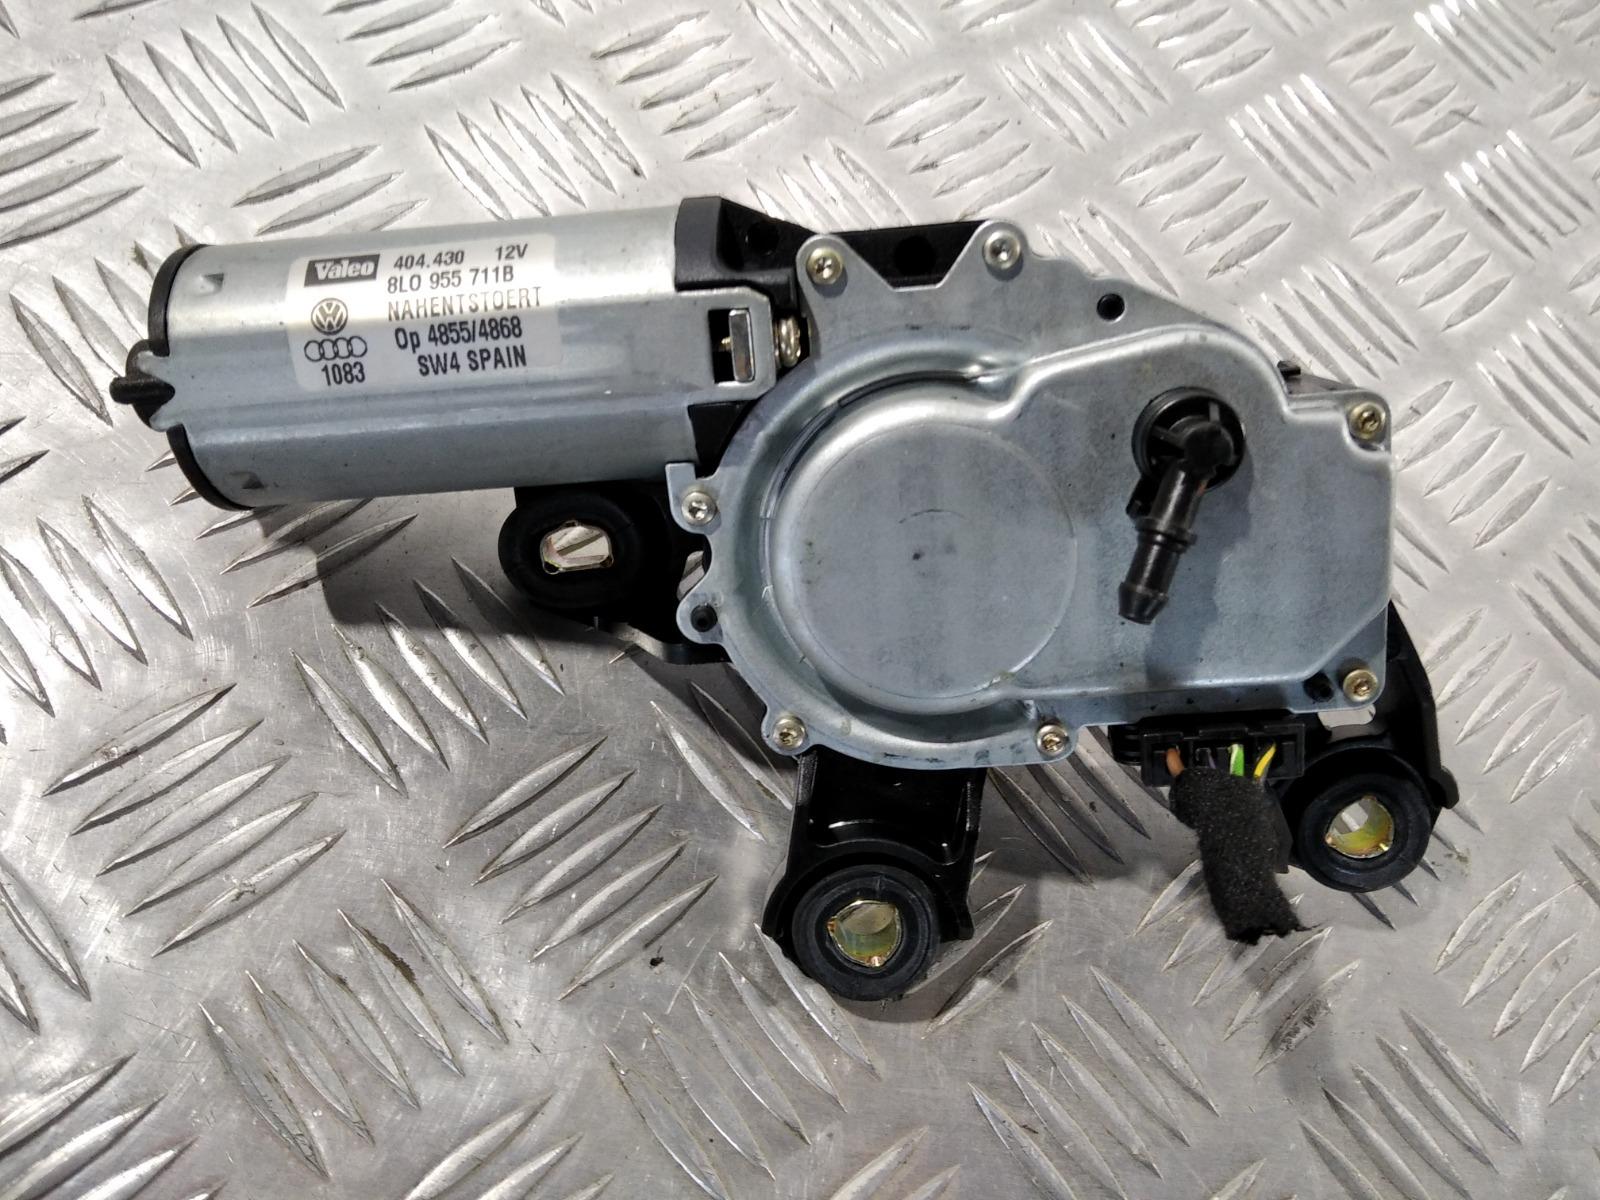 Моторчик заднего стеклоочистителя (дворника) Audi A6 C5 2.5 TDI 2003 (б/у)